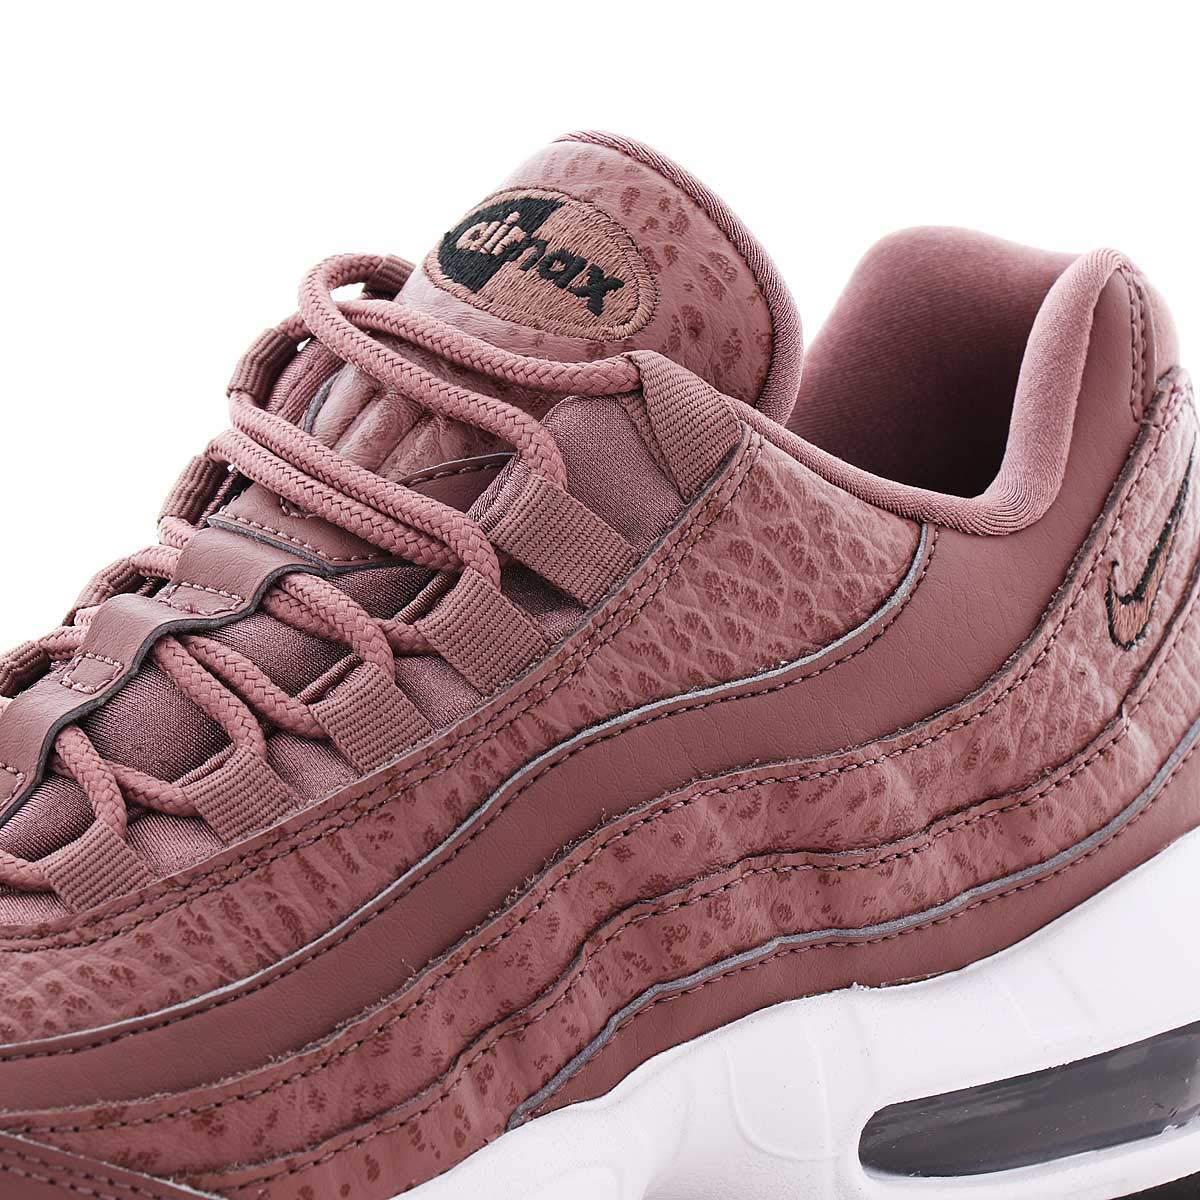 ad58bfc5865e18 Nike Damen WMNS Air Max 95 Lea Sneakers  Amazon.de  Schuhe   Handtaschen